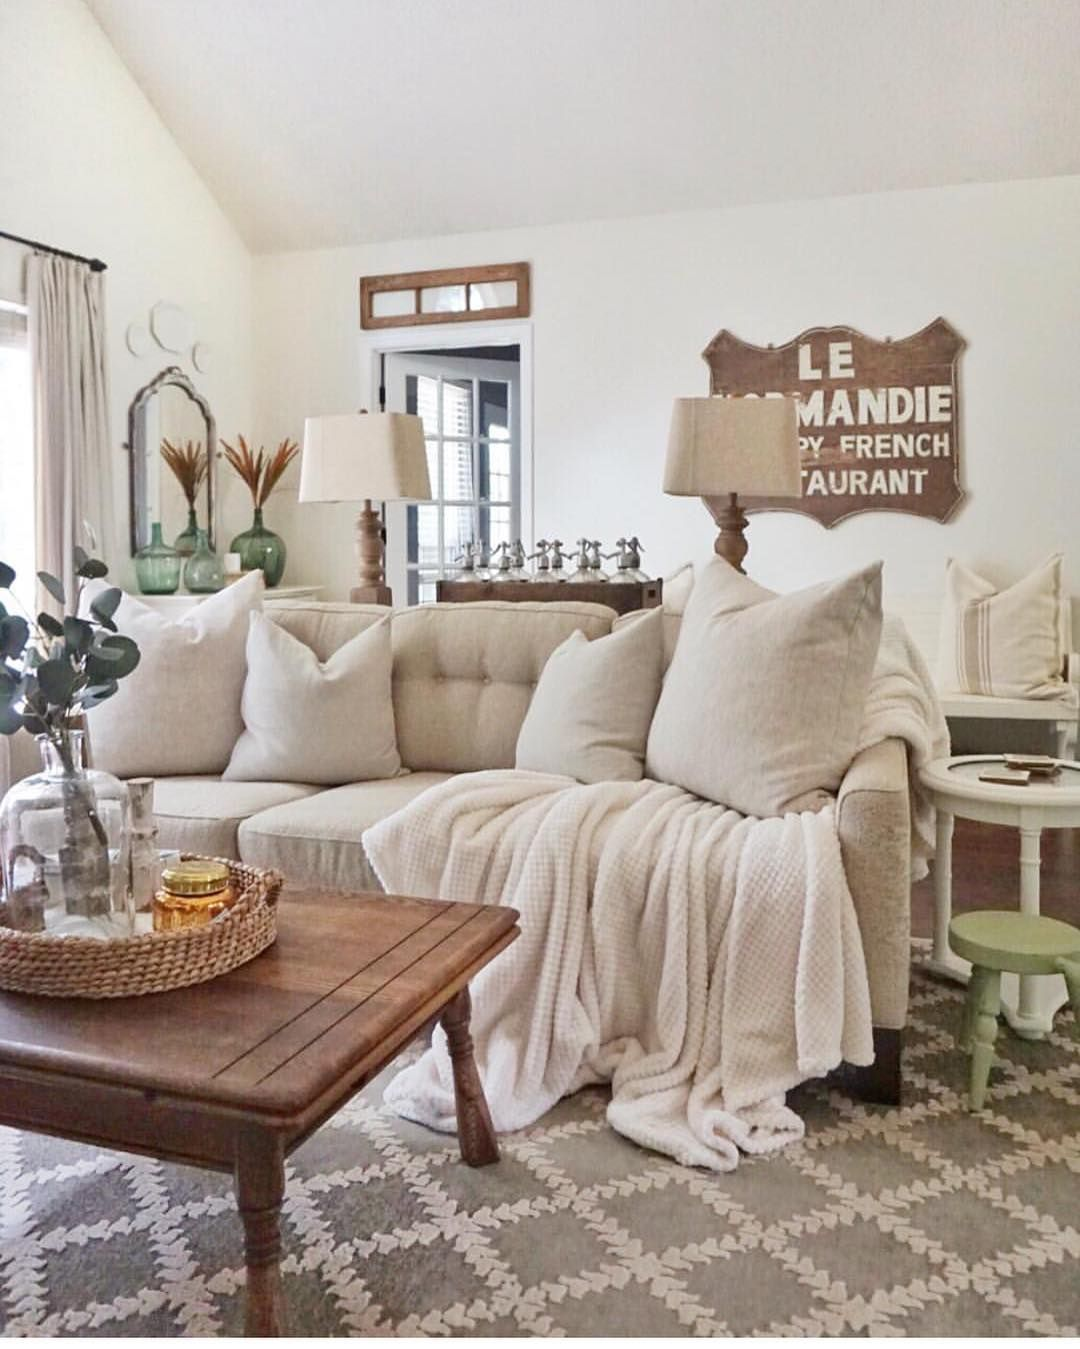 Sensational Cottages Bungalows Magazine On Instagram Our Kind Of Interior Design Ideas Gresisoteloinfo